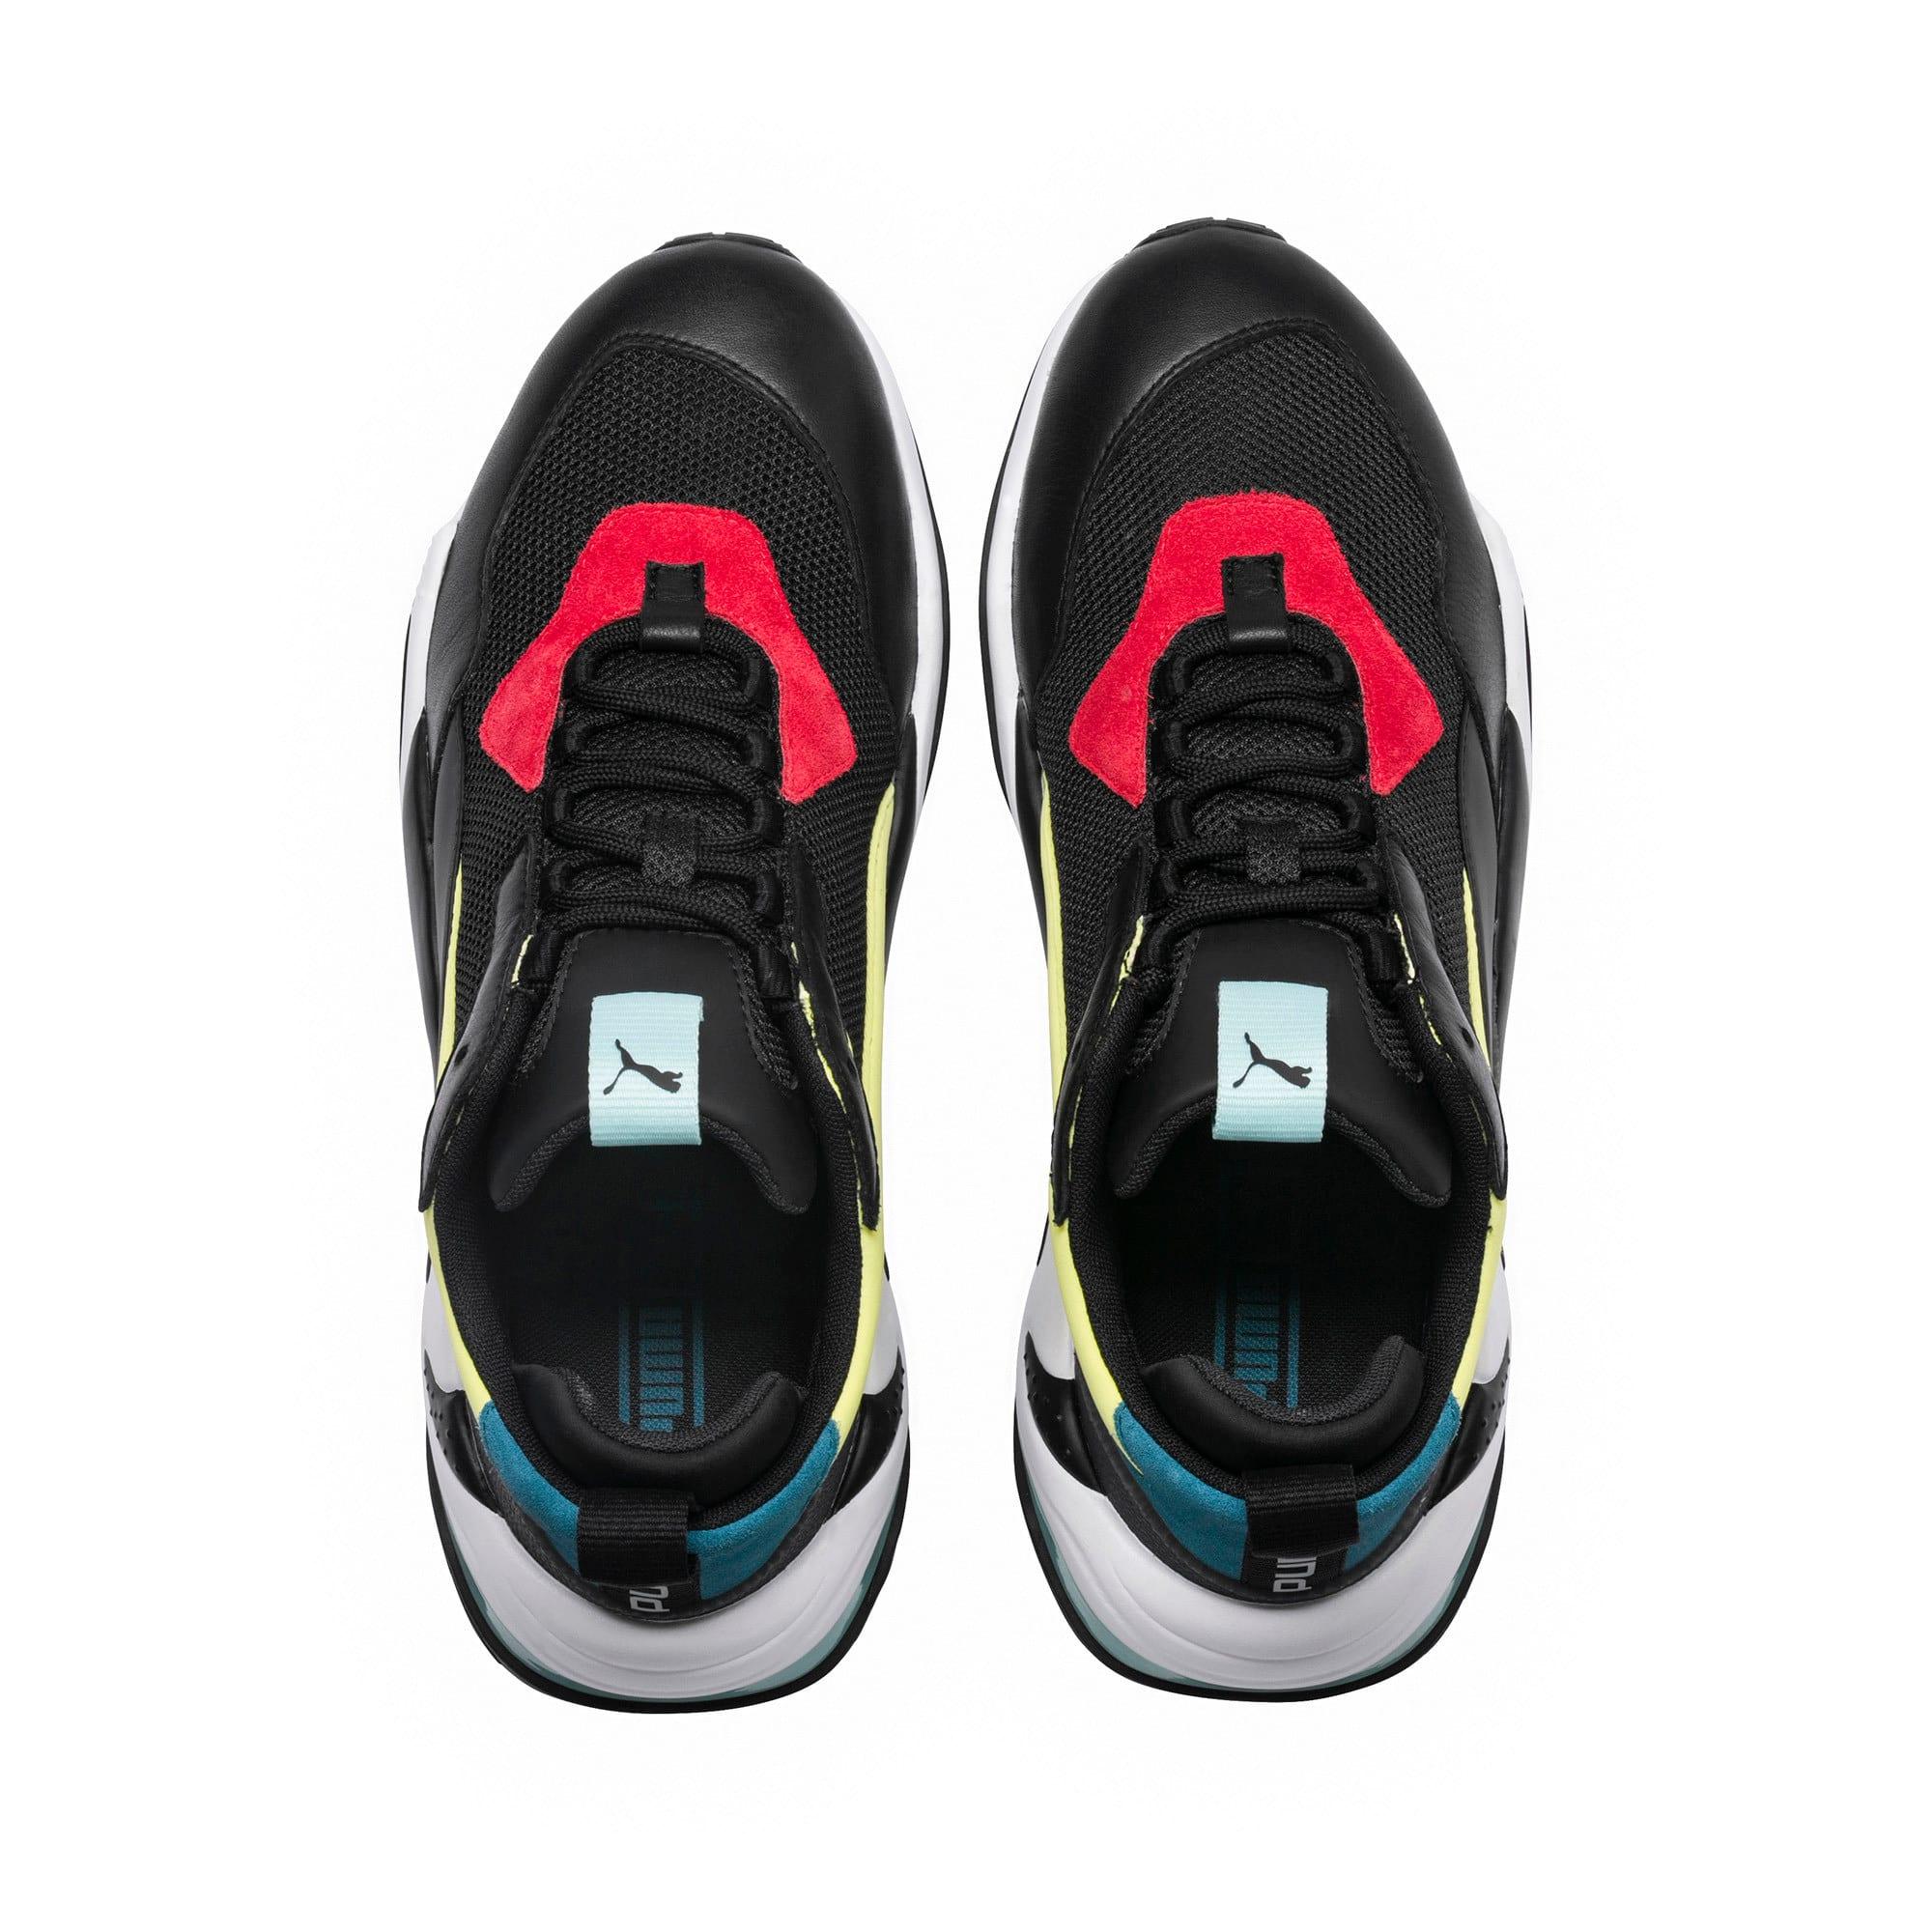 Thumbnail 6 of Sneakers Thunder Spectra, Puma Blk-Puma Blk-Puma White, medium